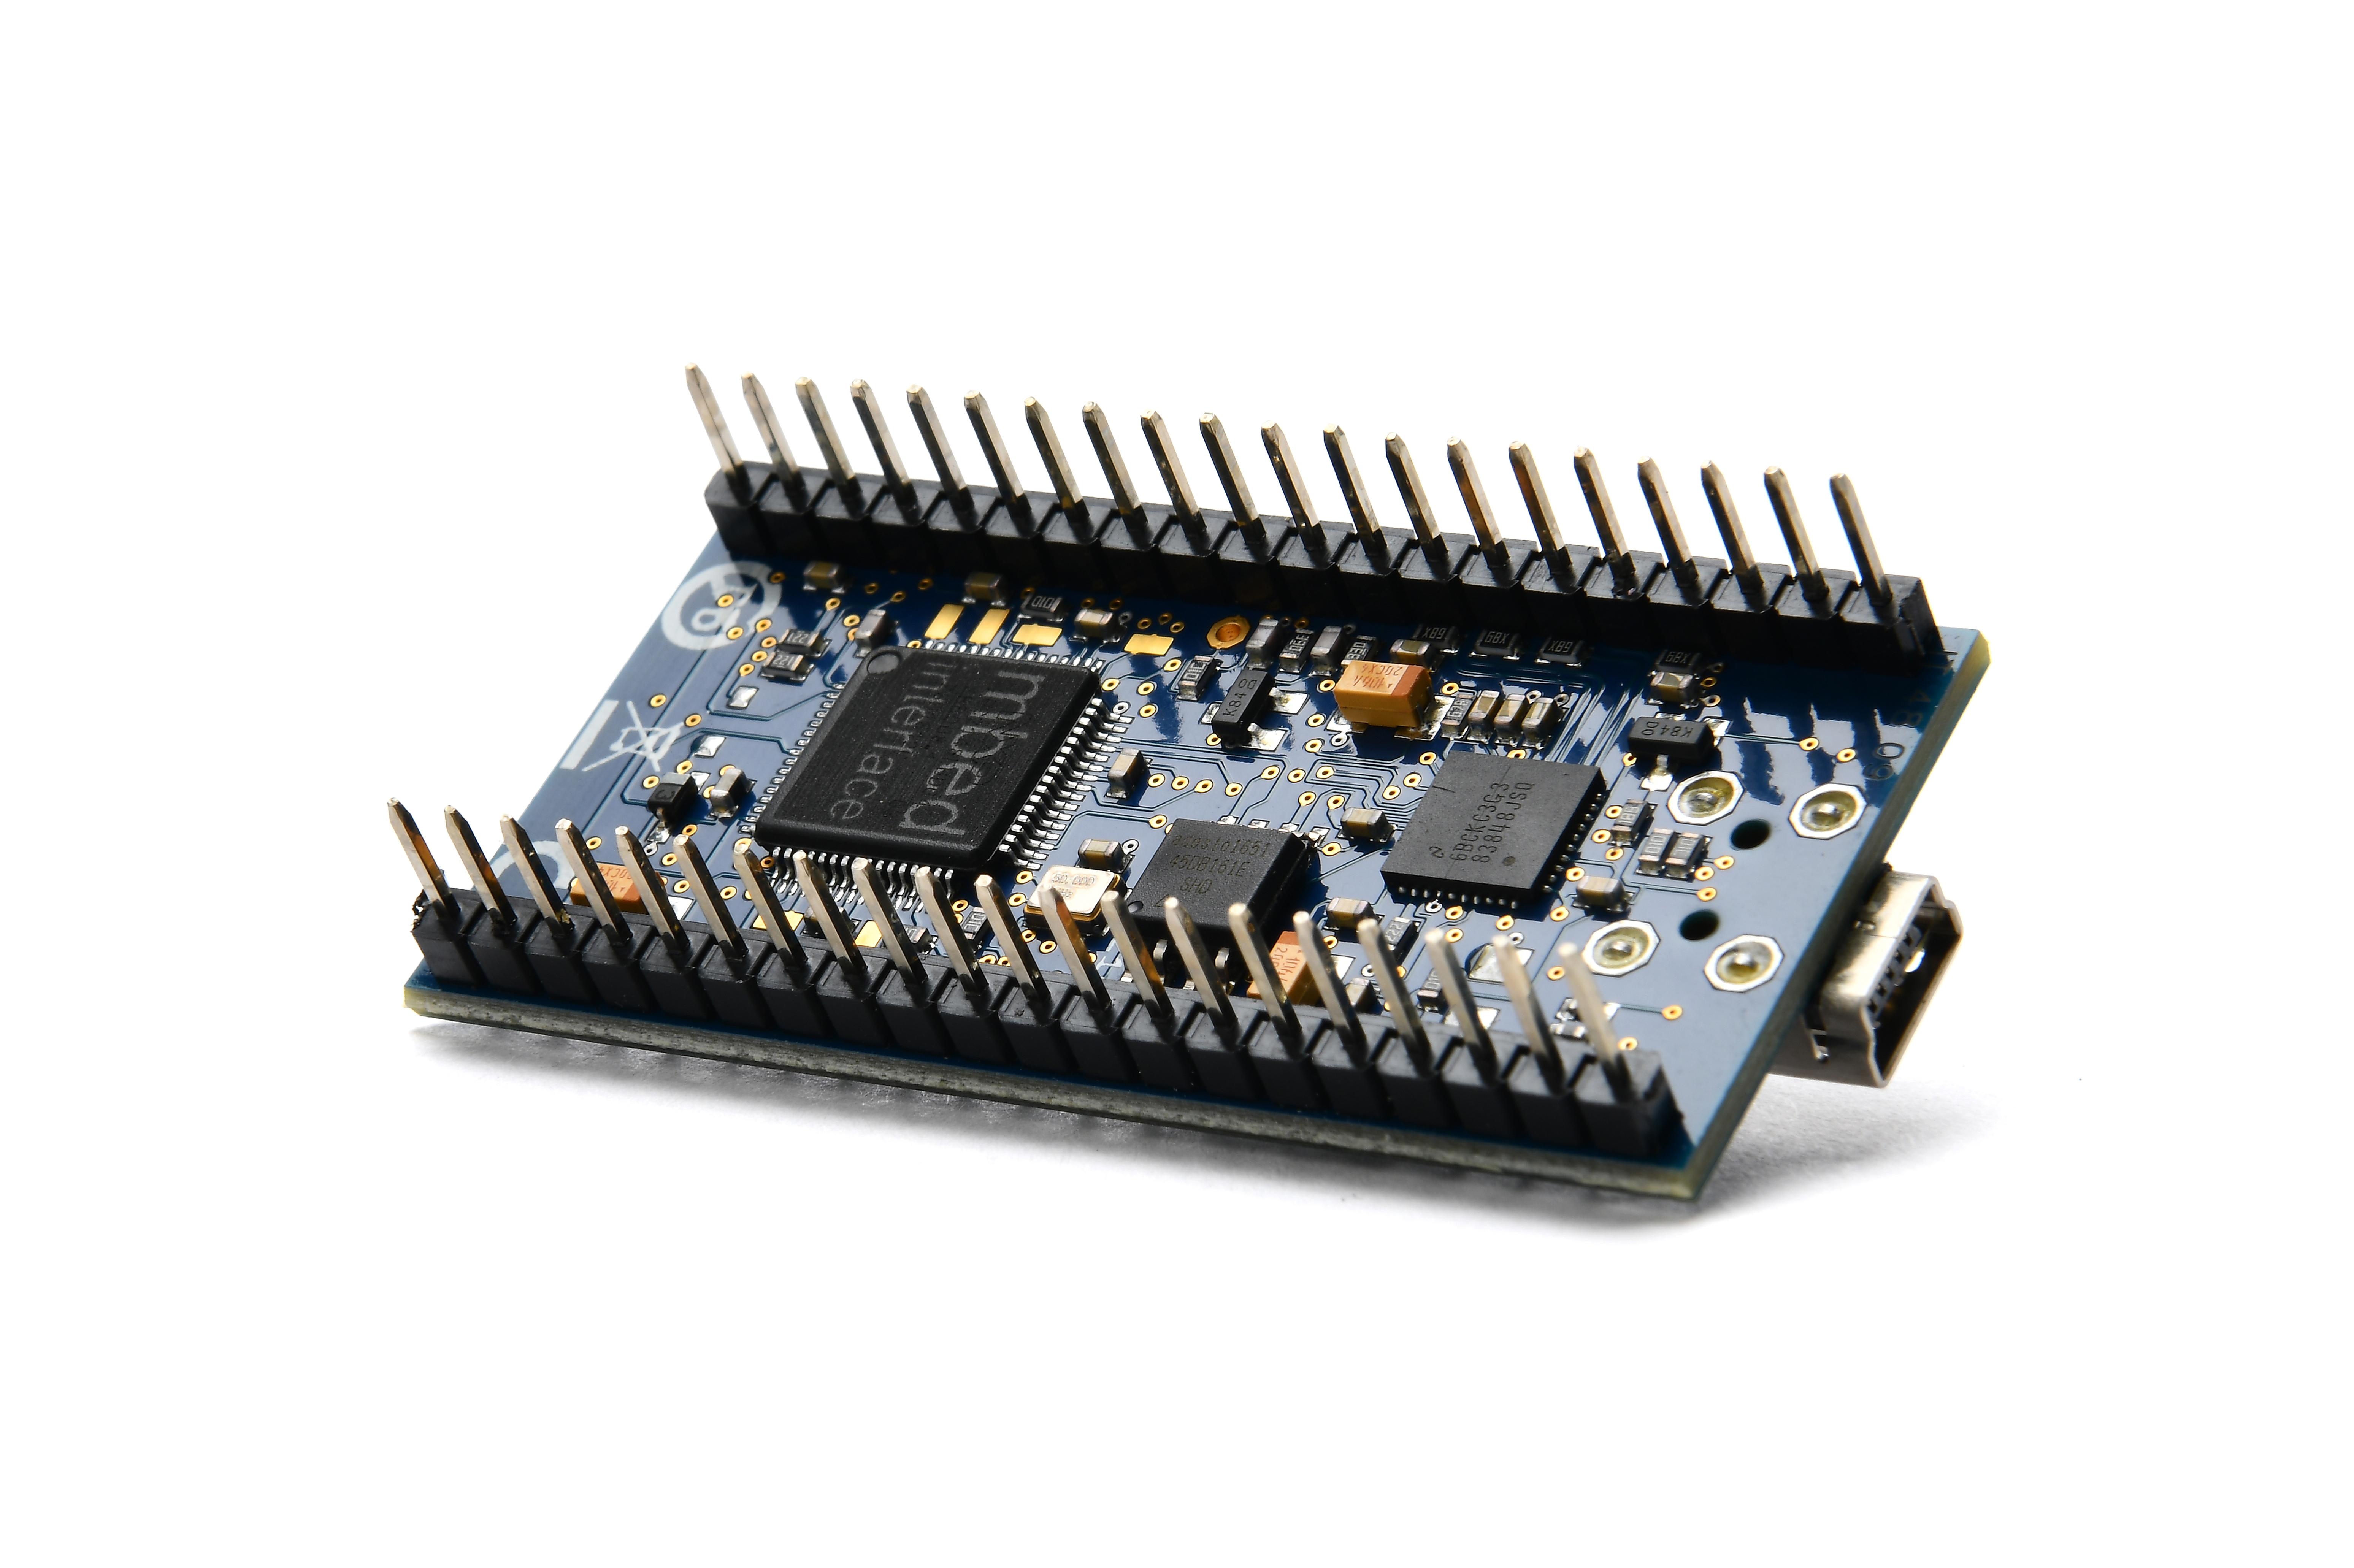 ARM mbed LPC1768 Modulo